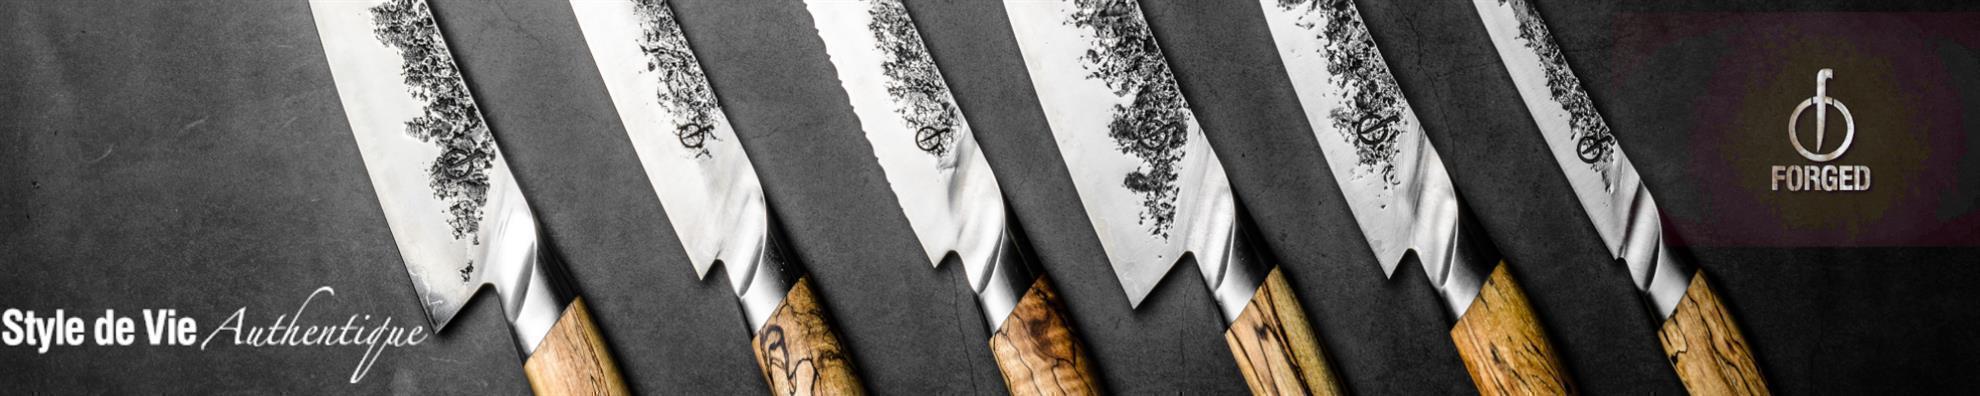 Forged - Lederhülle Fleischmesser